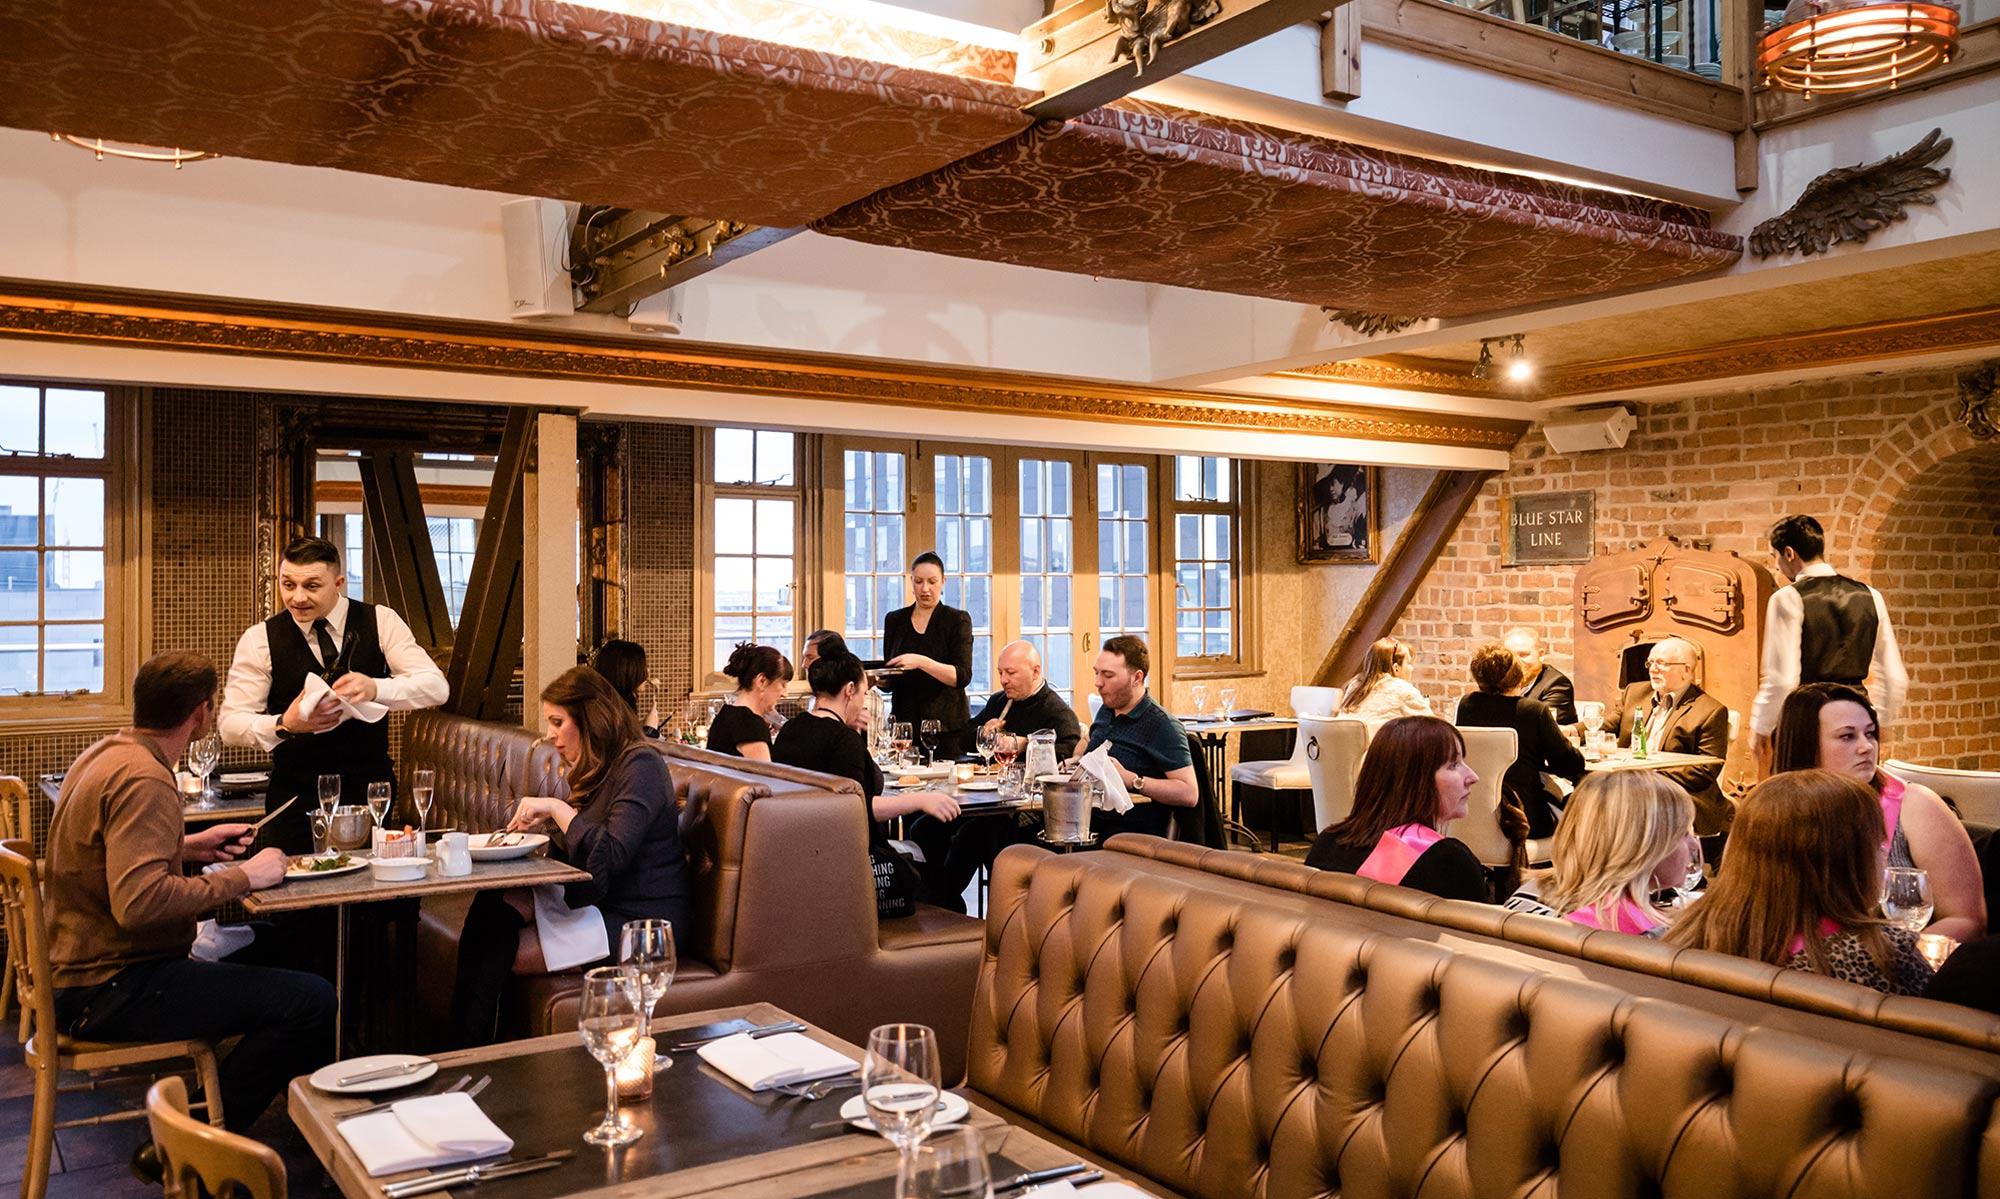 Liverpool bar and restaurants - Carpathia